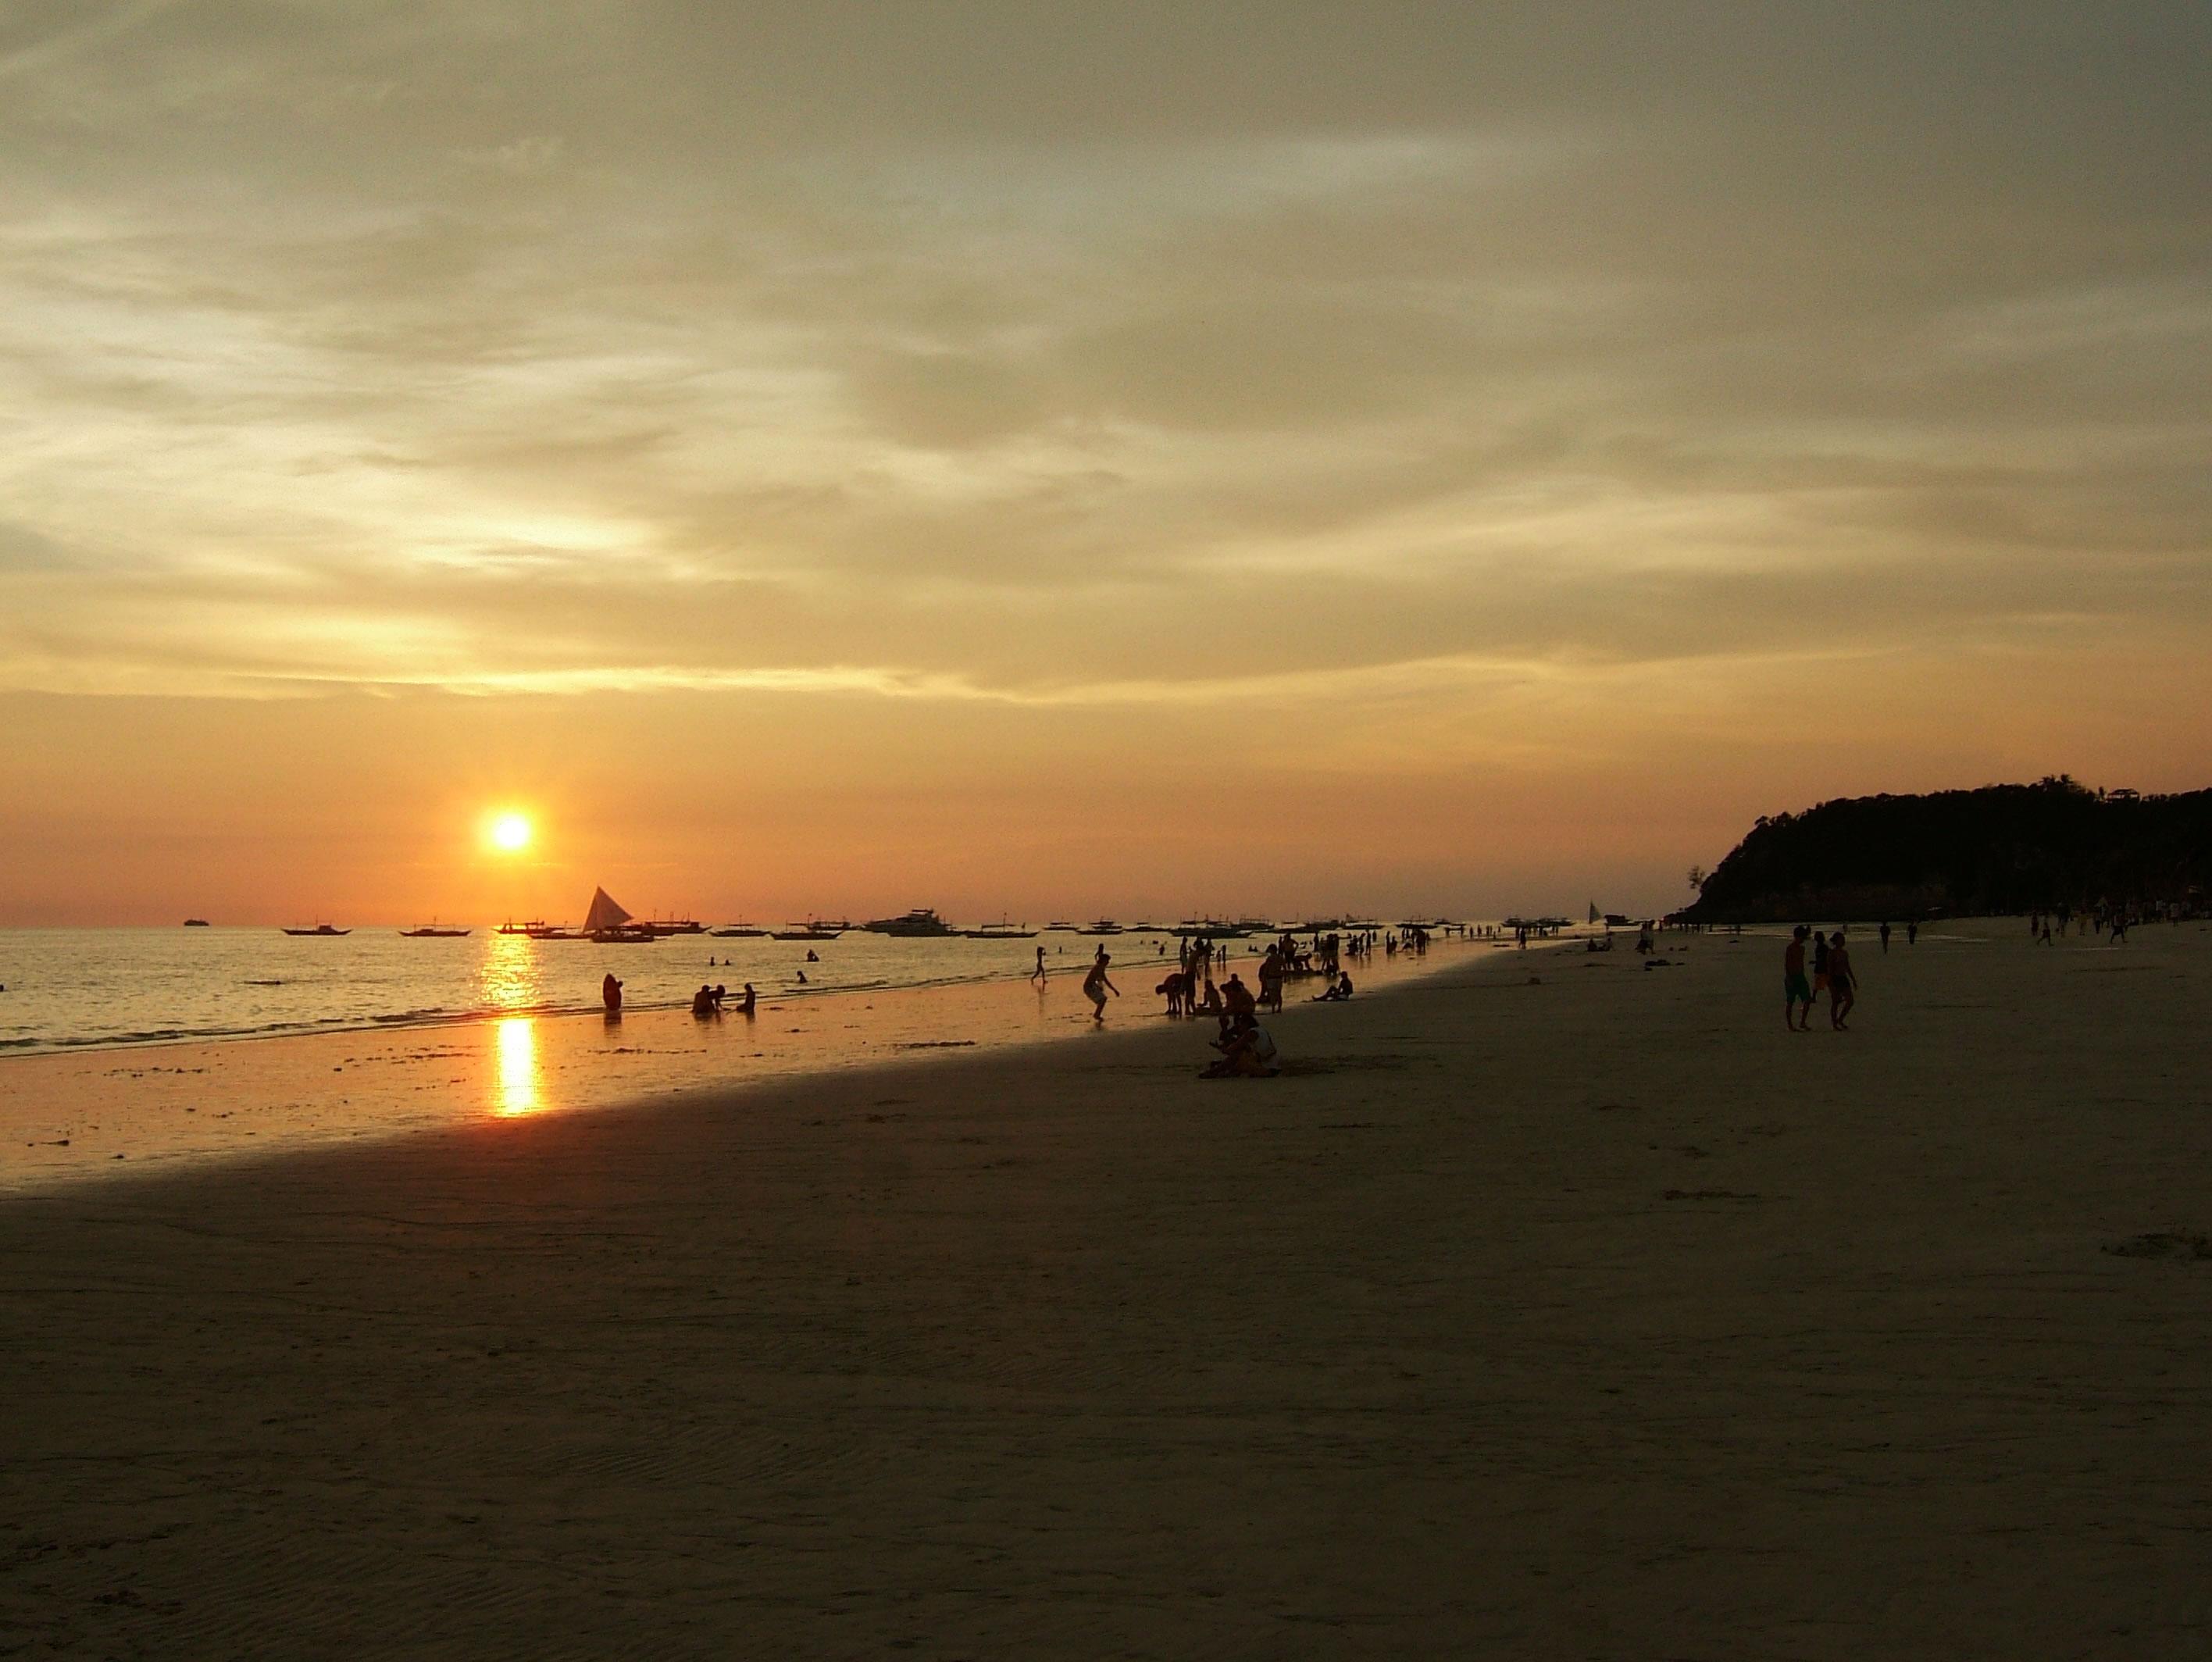 Philippines Sugar Islands Caticlan Boracay White Beach Sunset 2007 15